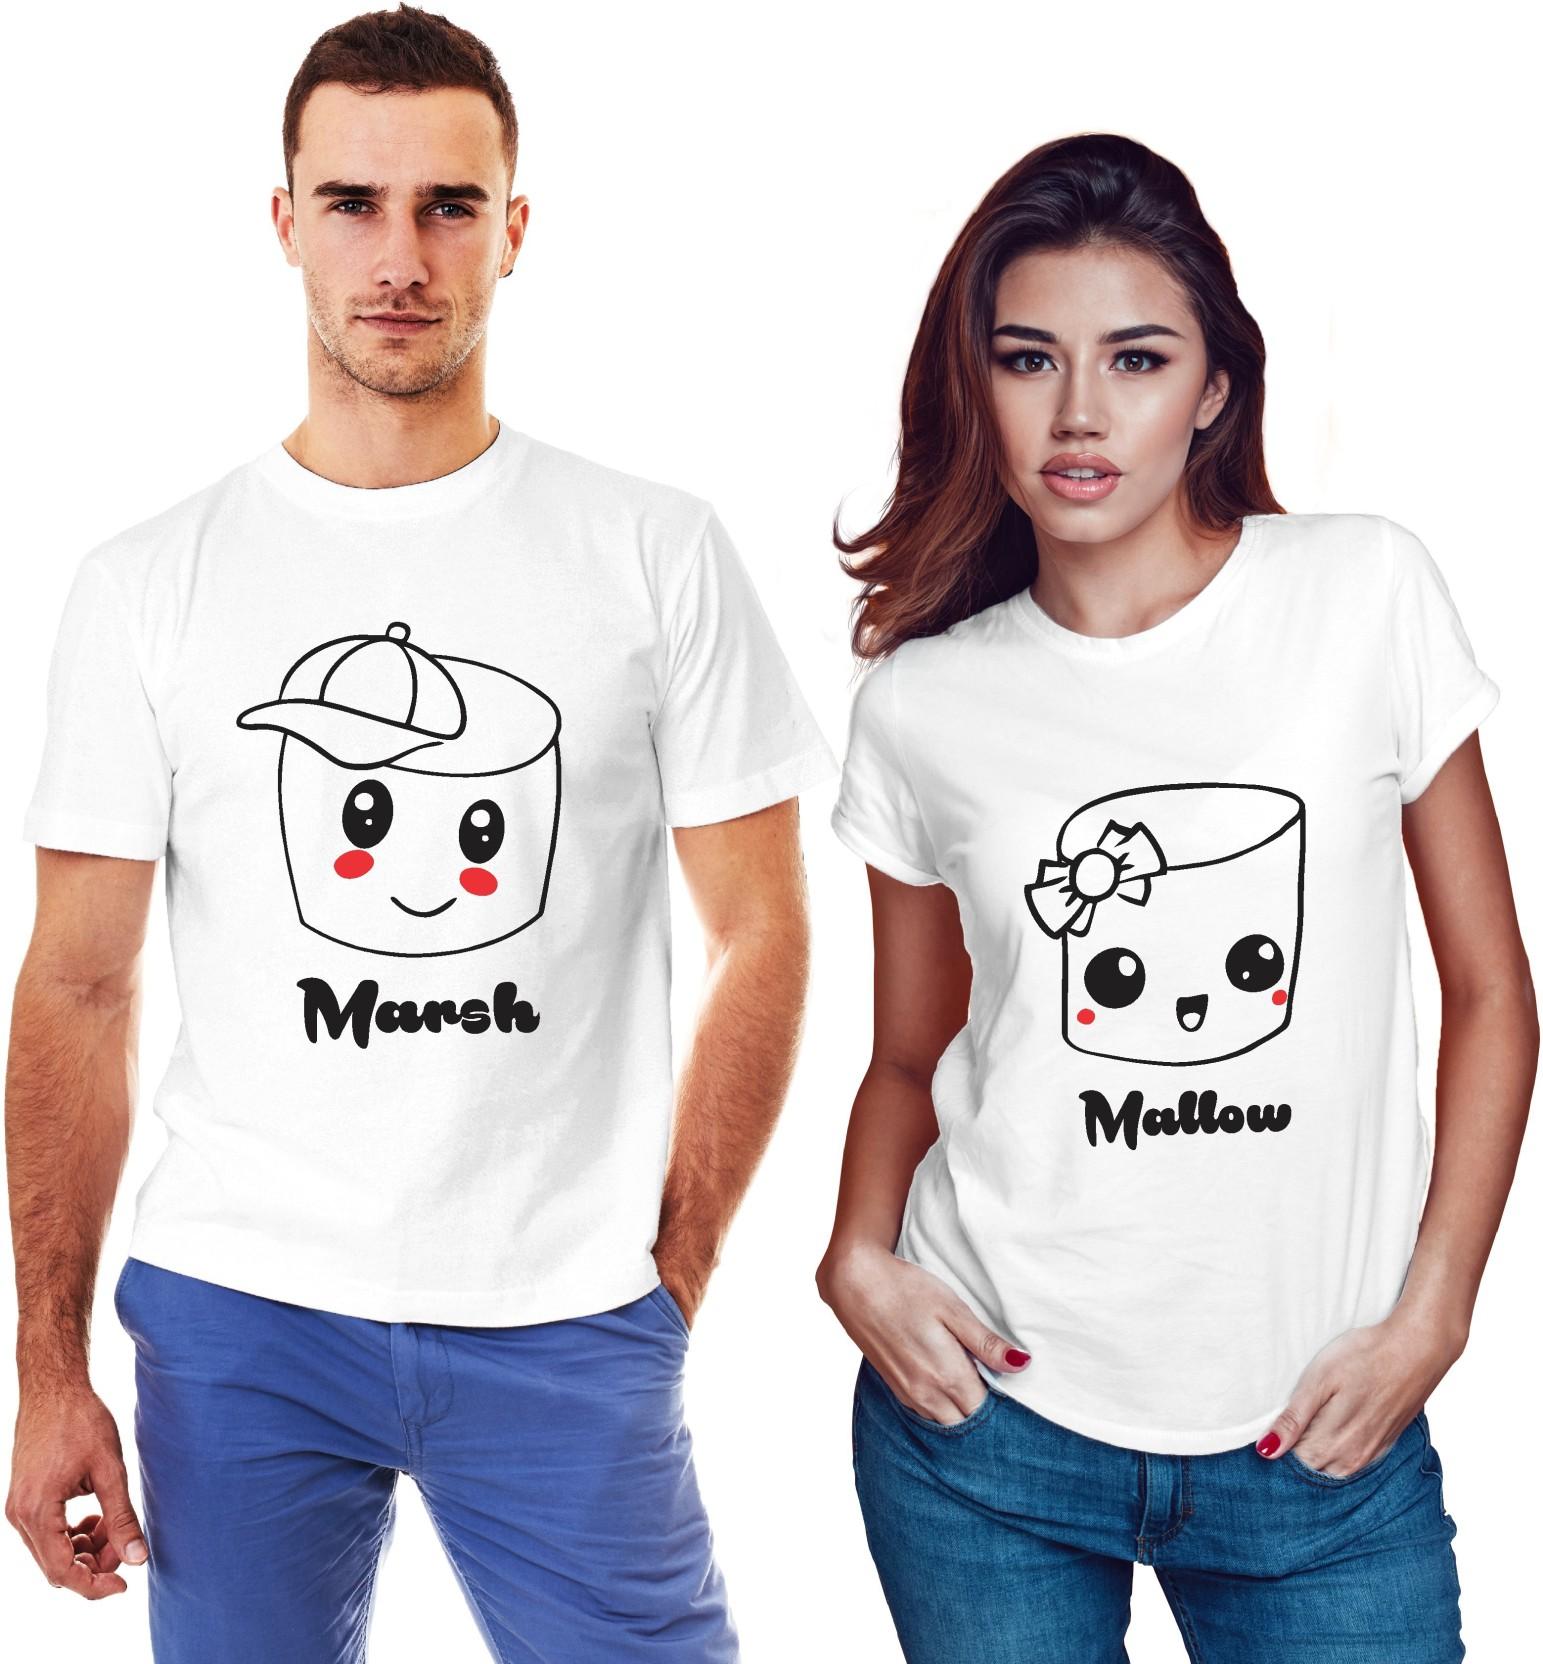 a8ff245194 Couple Shirt Online Shopping India - DREAMWORKS